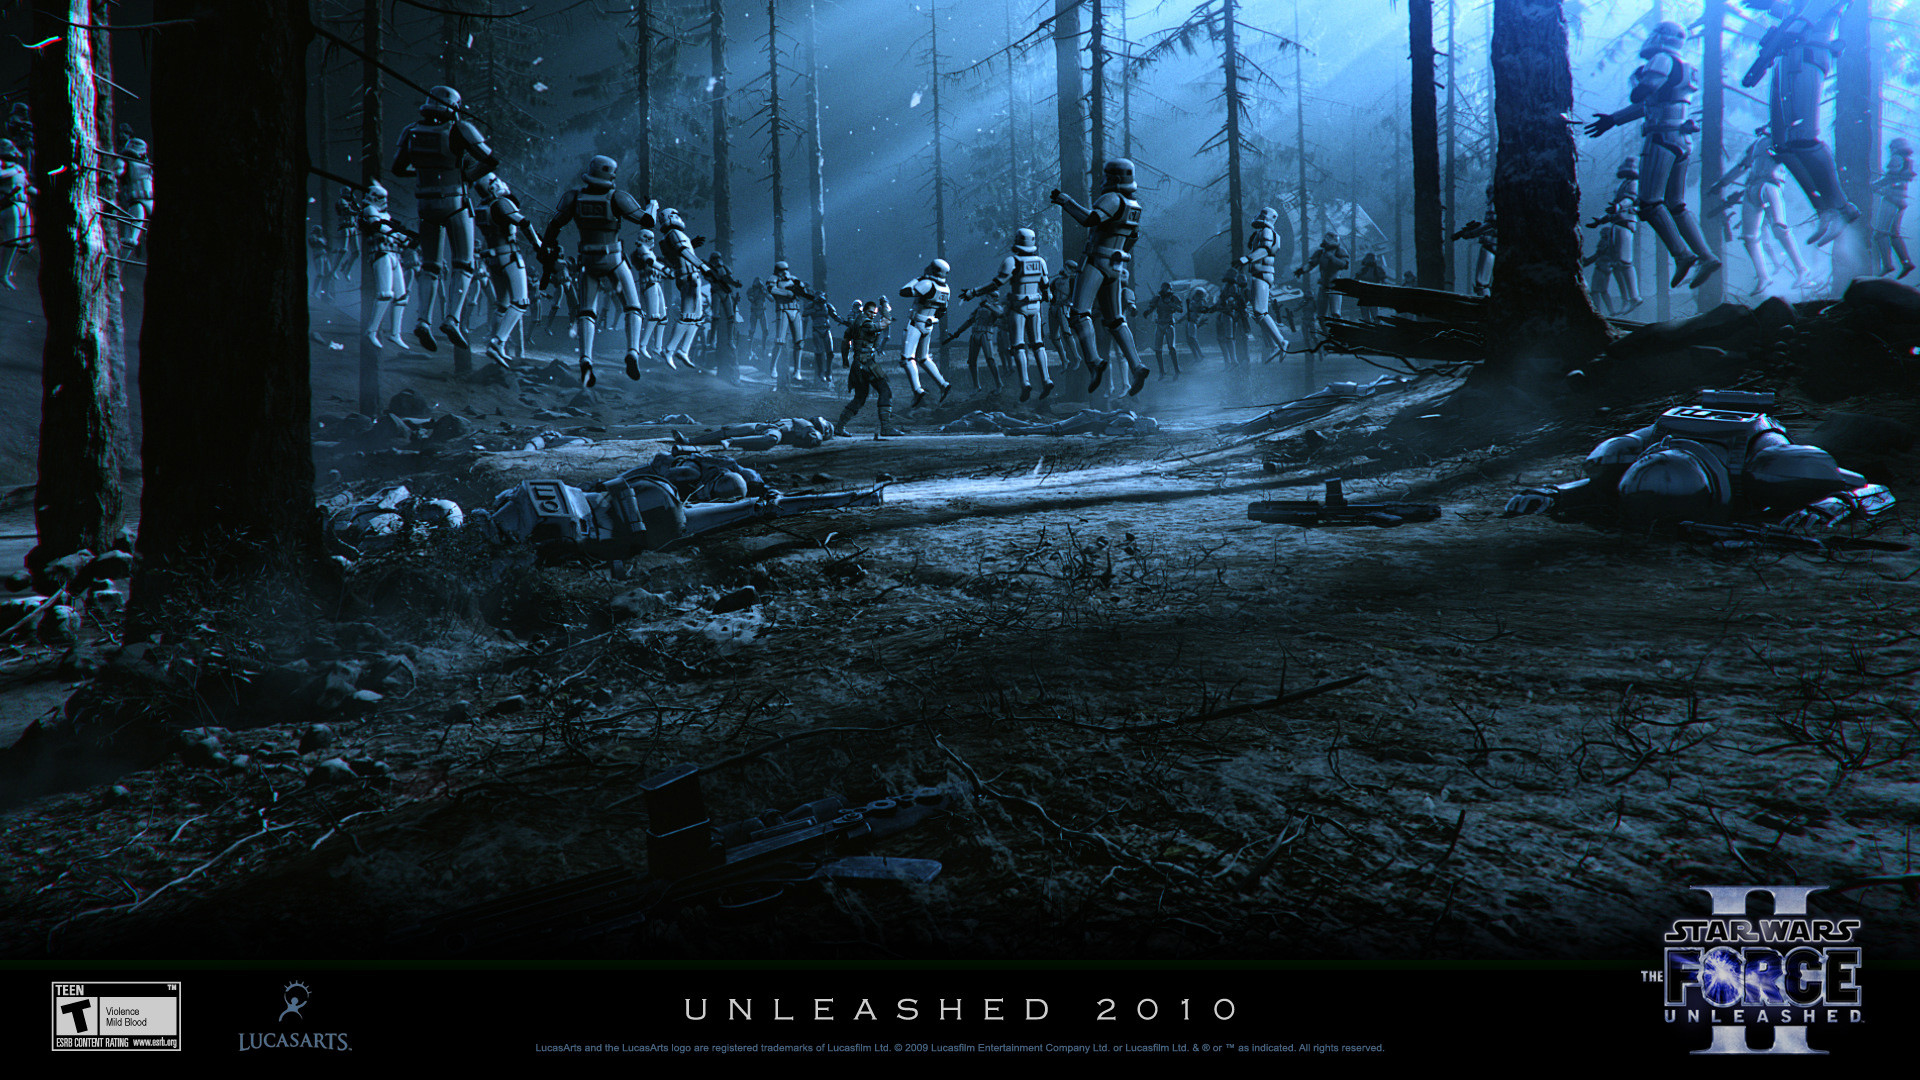 Download - Star Wars - Tfu2 , HD Wallpaper & Backgrounds